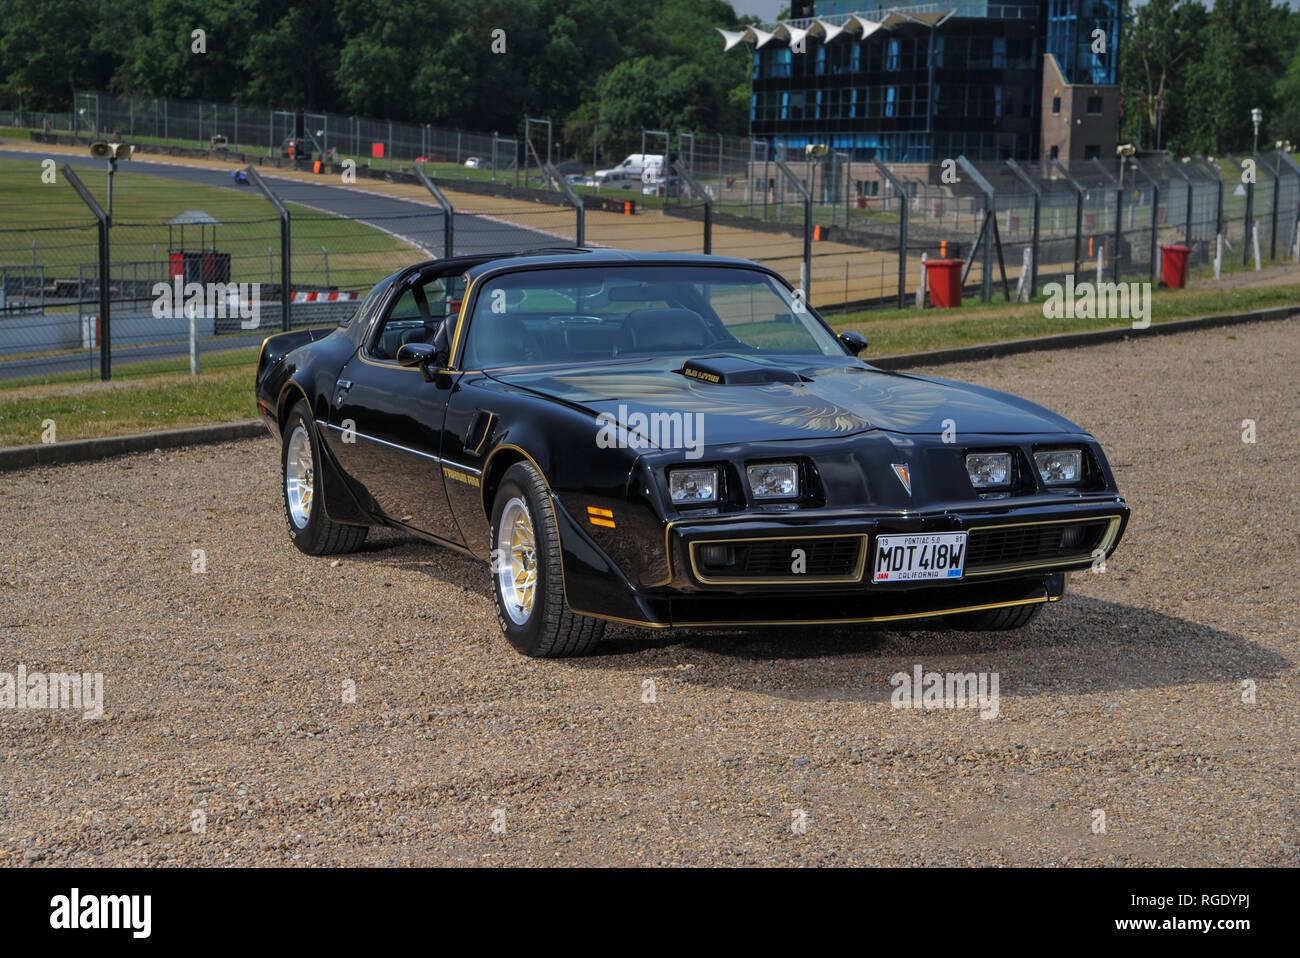 1980 pontiac trans am - classic american muscle car und verraucht